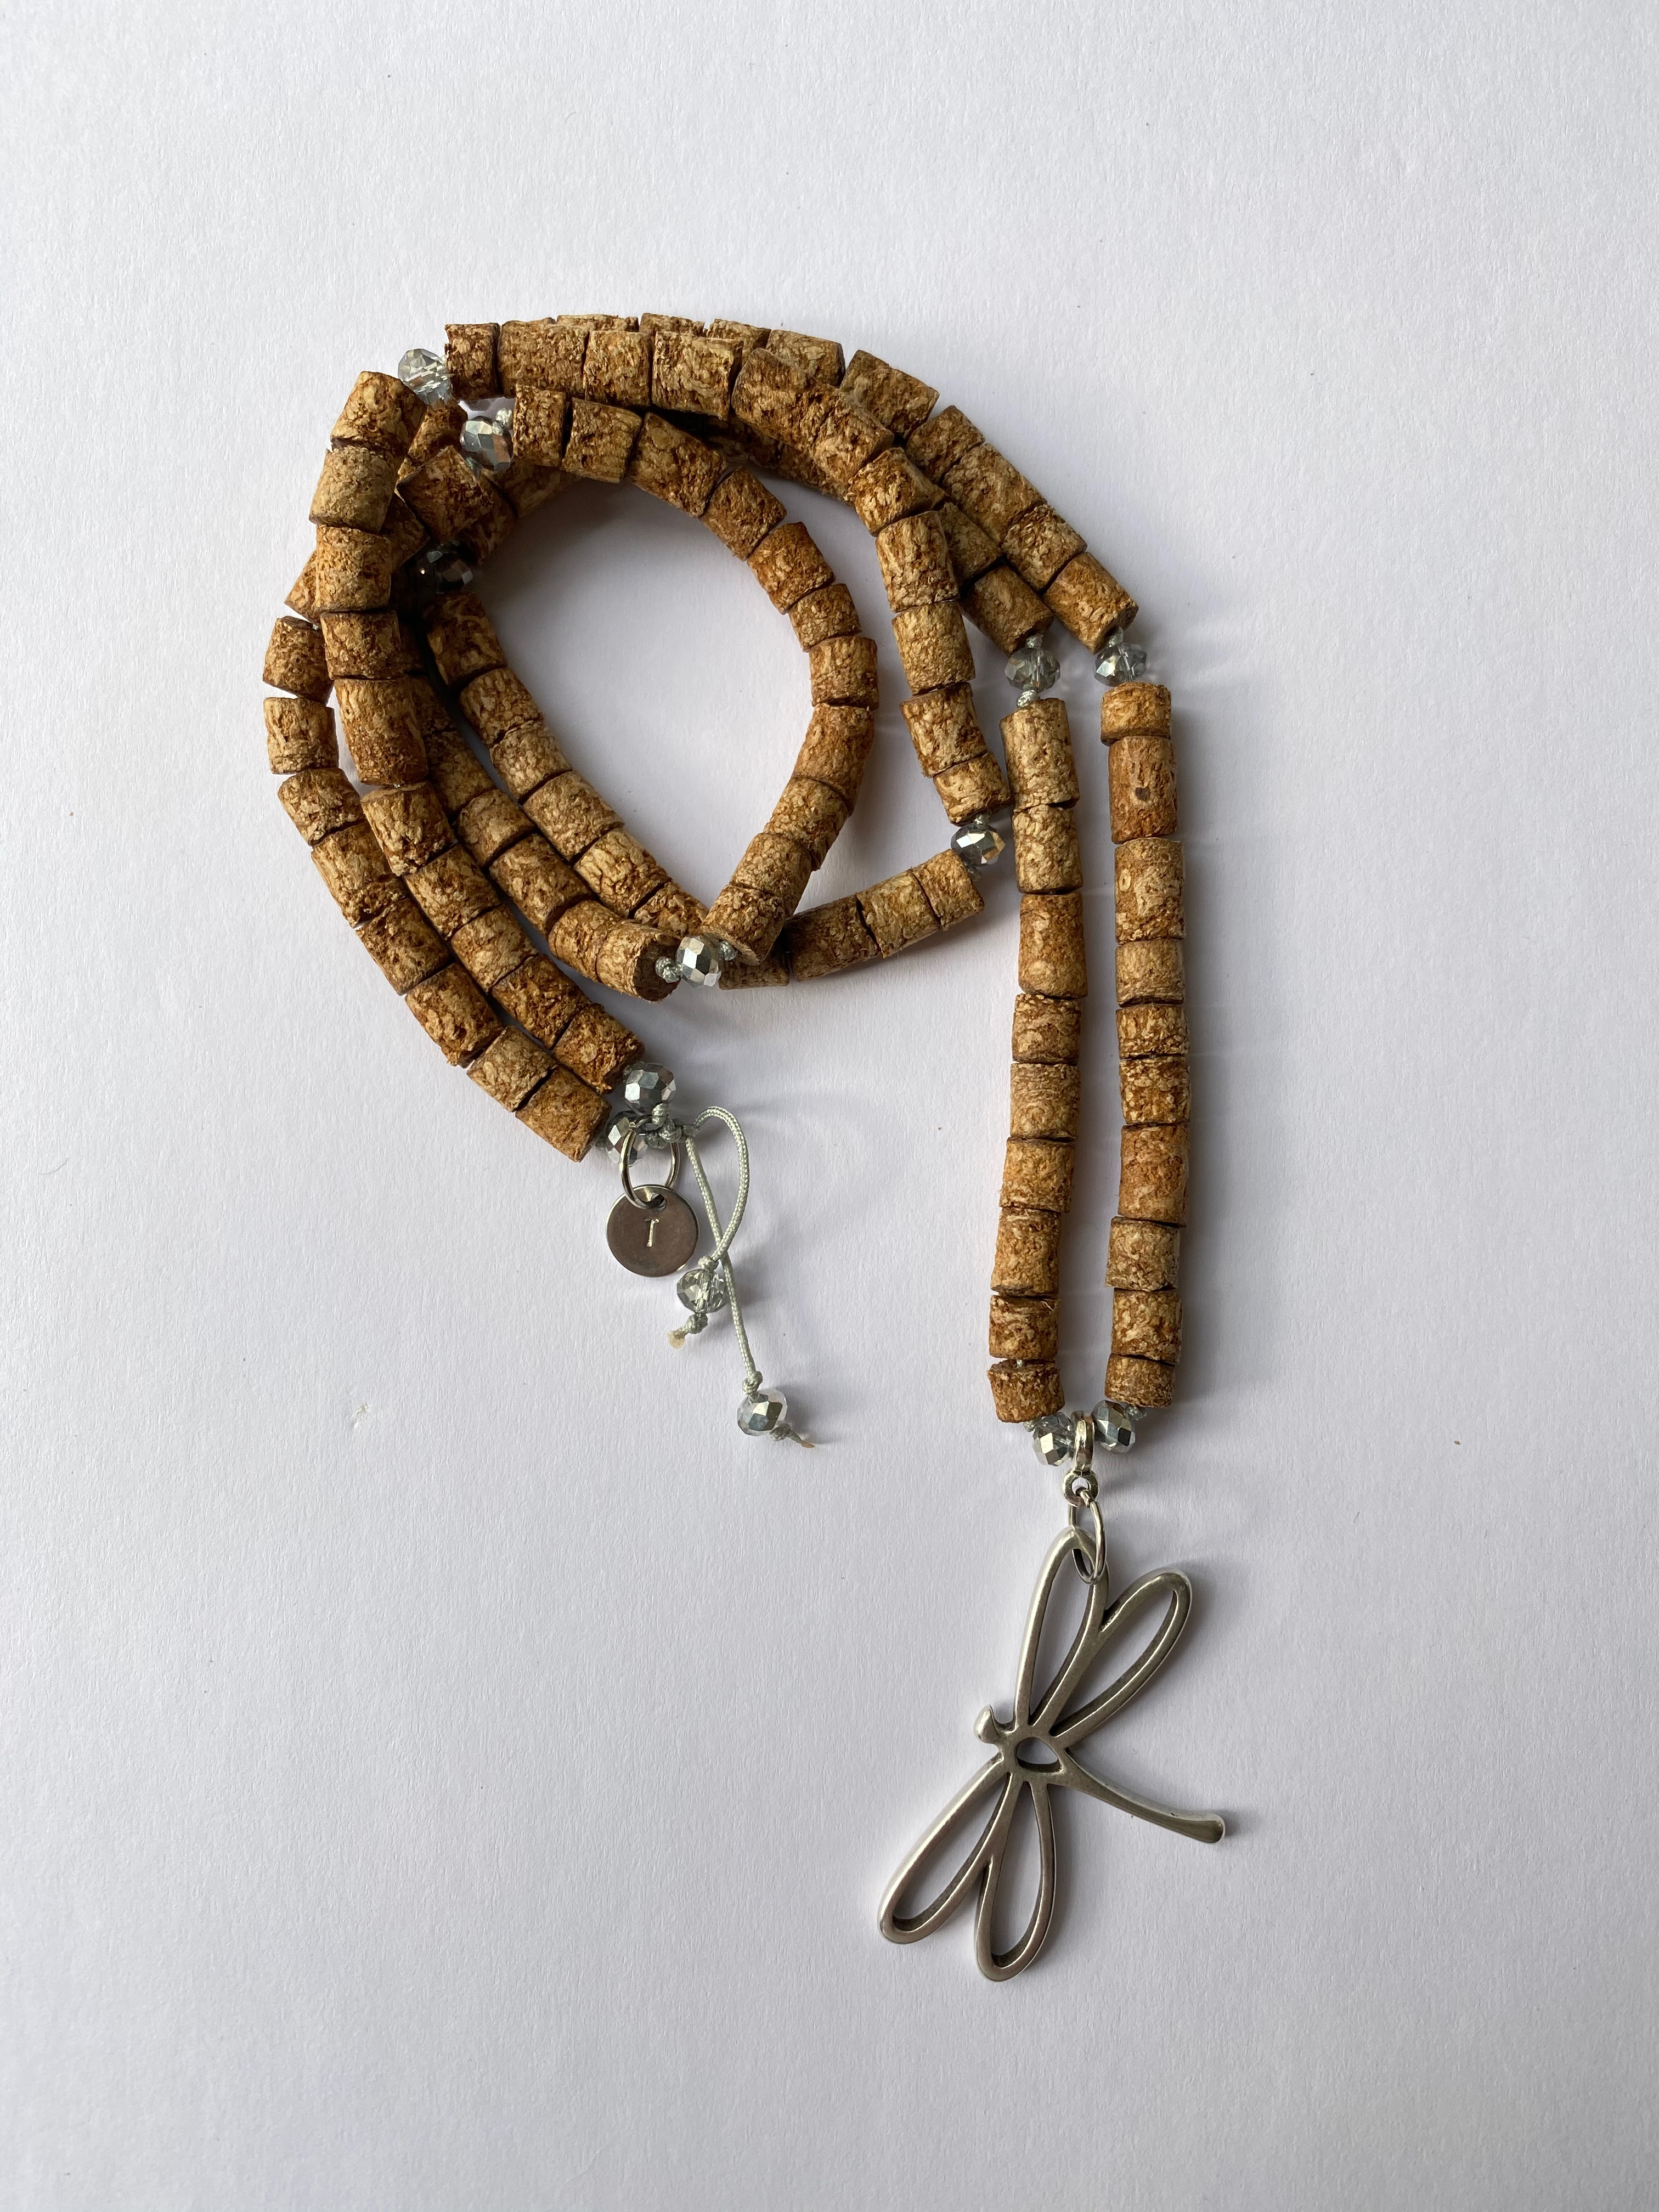 31- STEEL DRAGONFLY cork